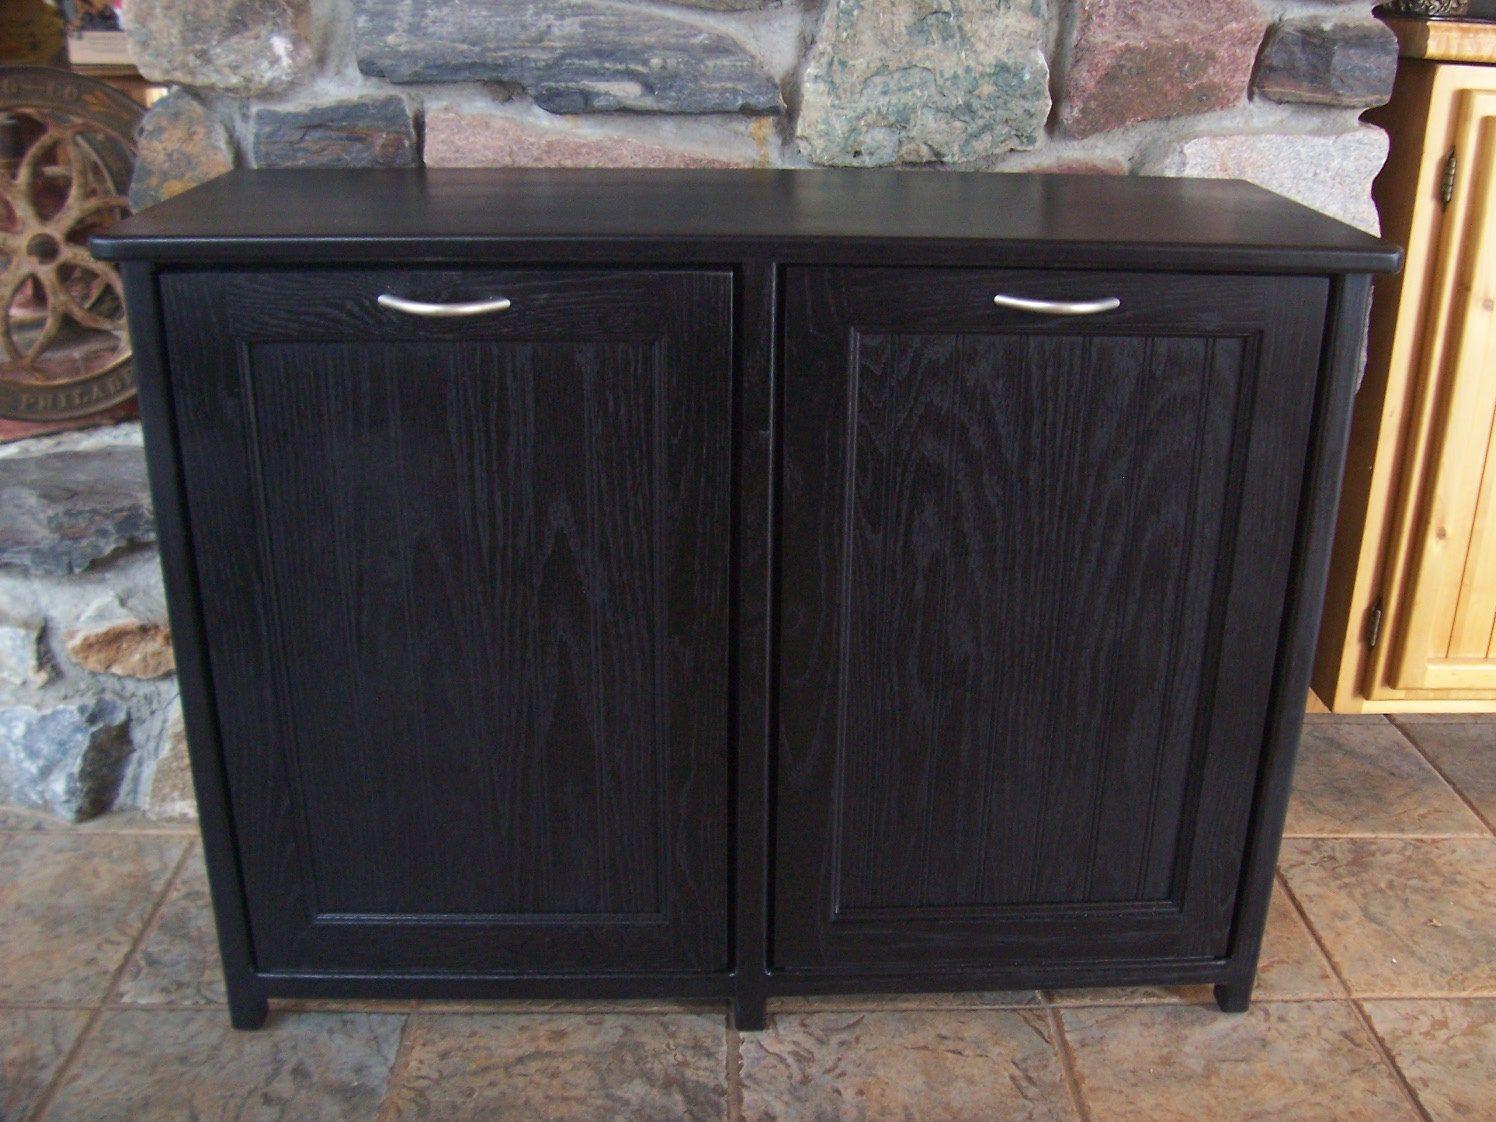 New Black Painted Wood Double Trash Bin Cabinet Garbage